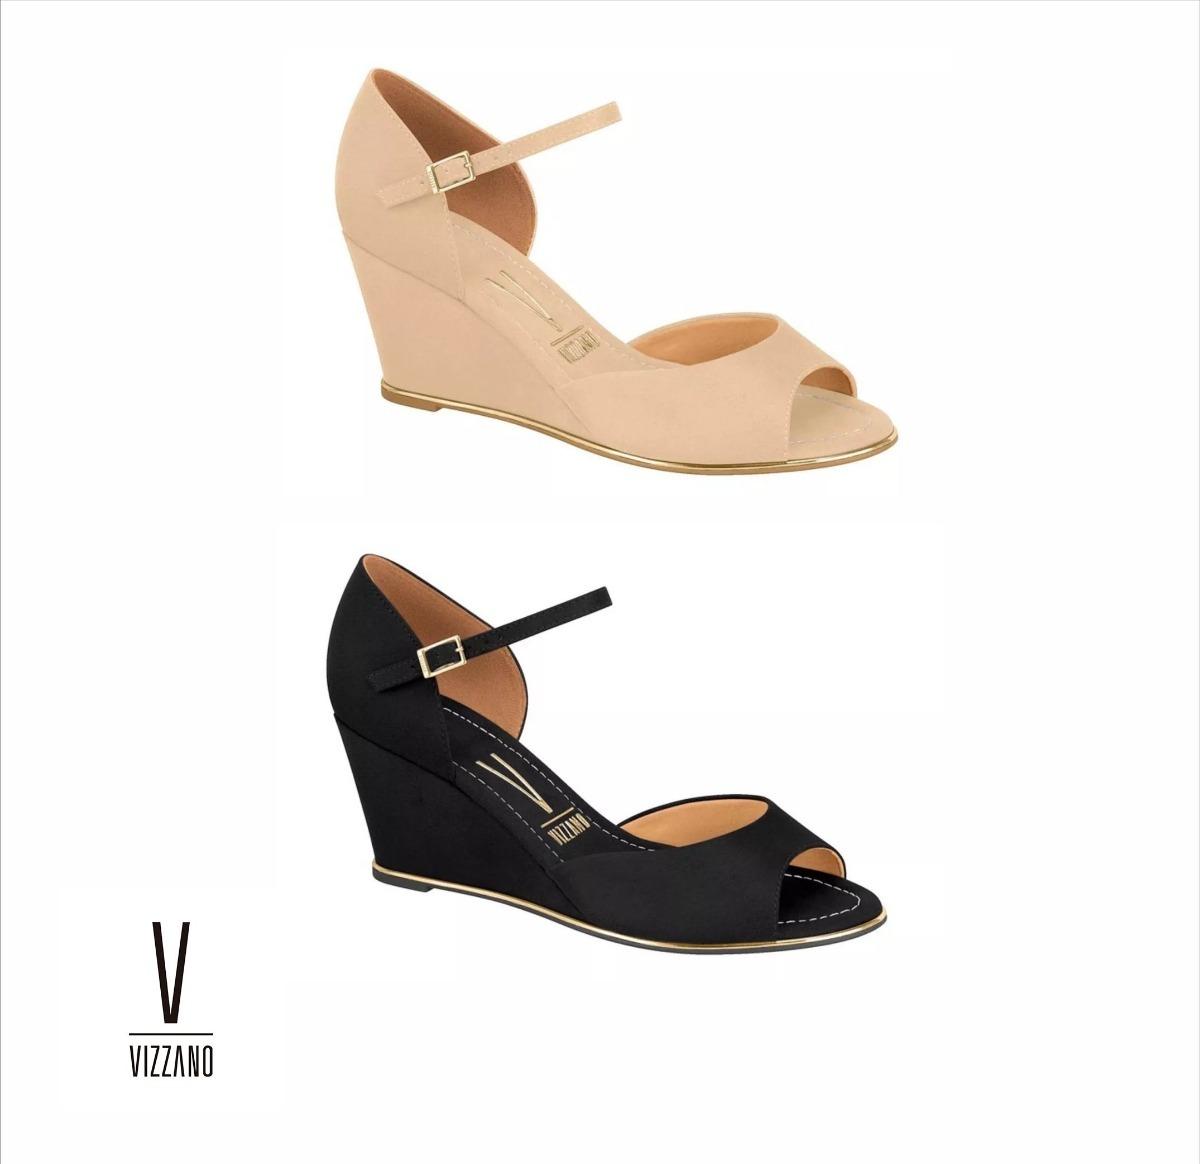 90d15deaa5 sandália feminina anabela vizzano 6271.111 - preto - bege. Carregando zoom.